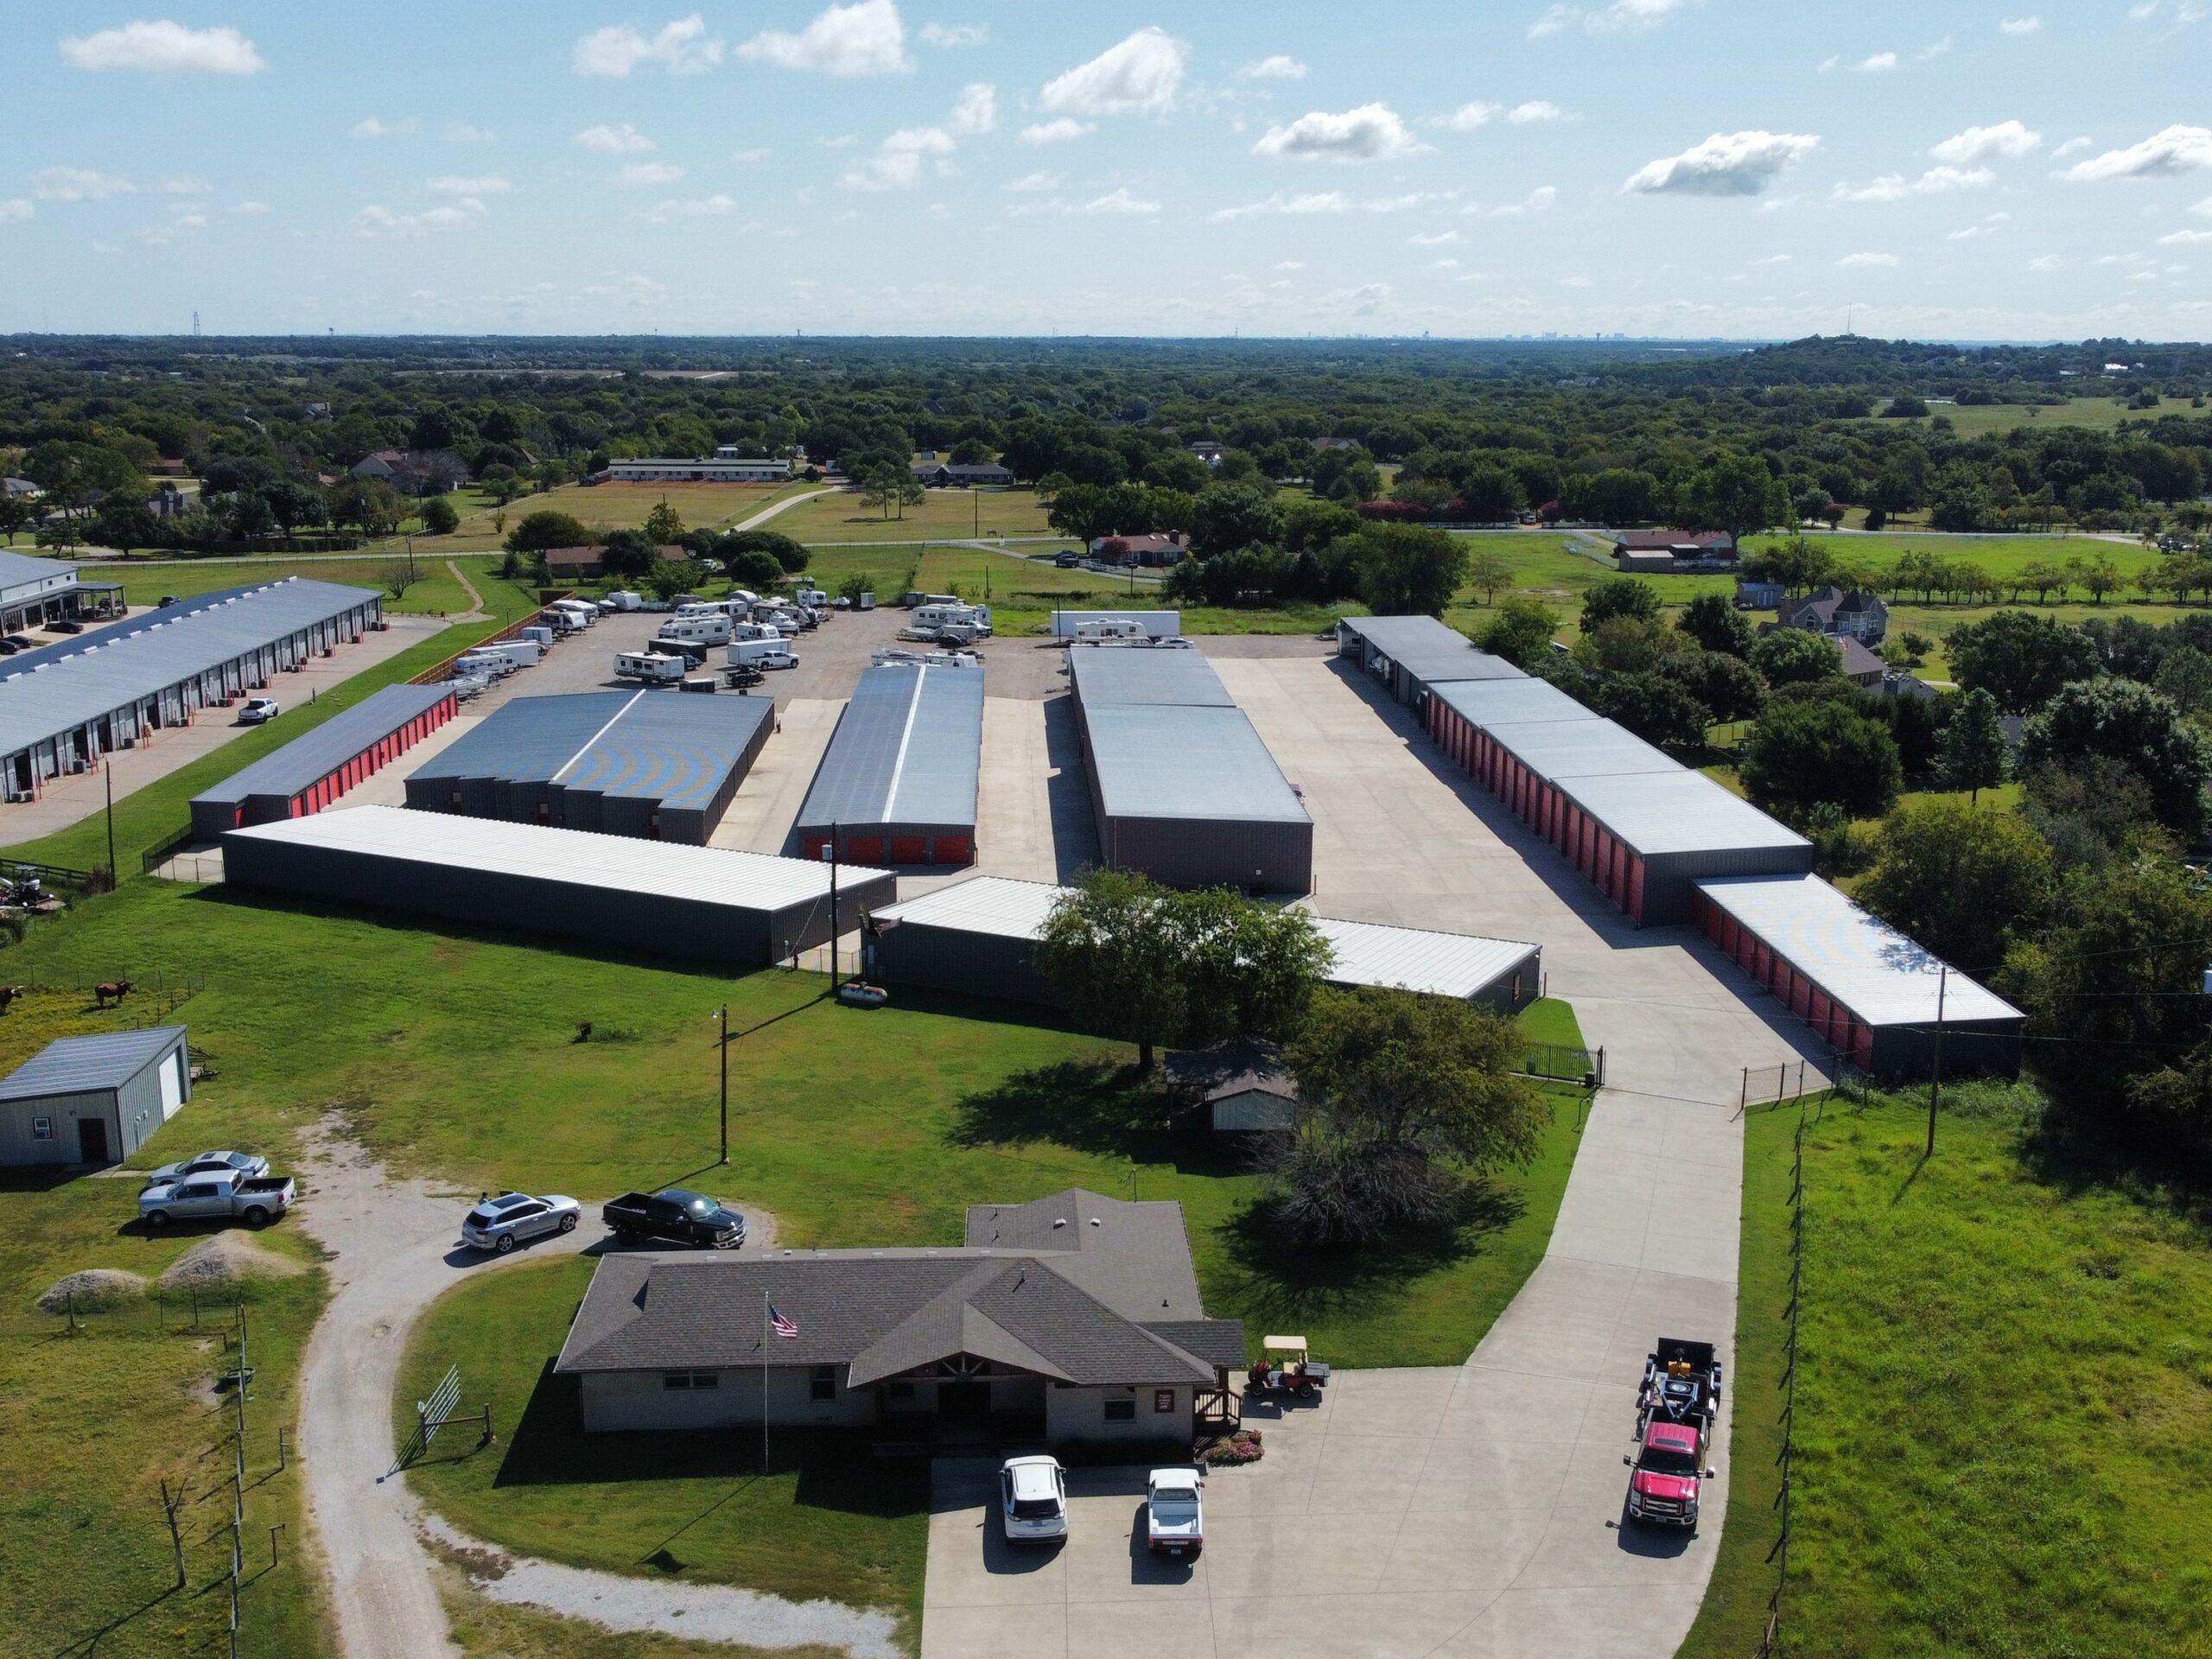 Argyle Storage Co. - Self Storage Facility For Sale in Texas by The Karr Self Storage Team